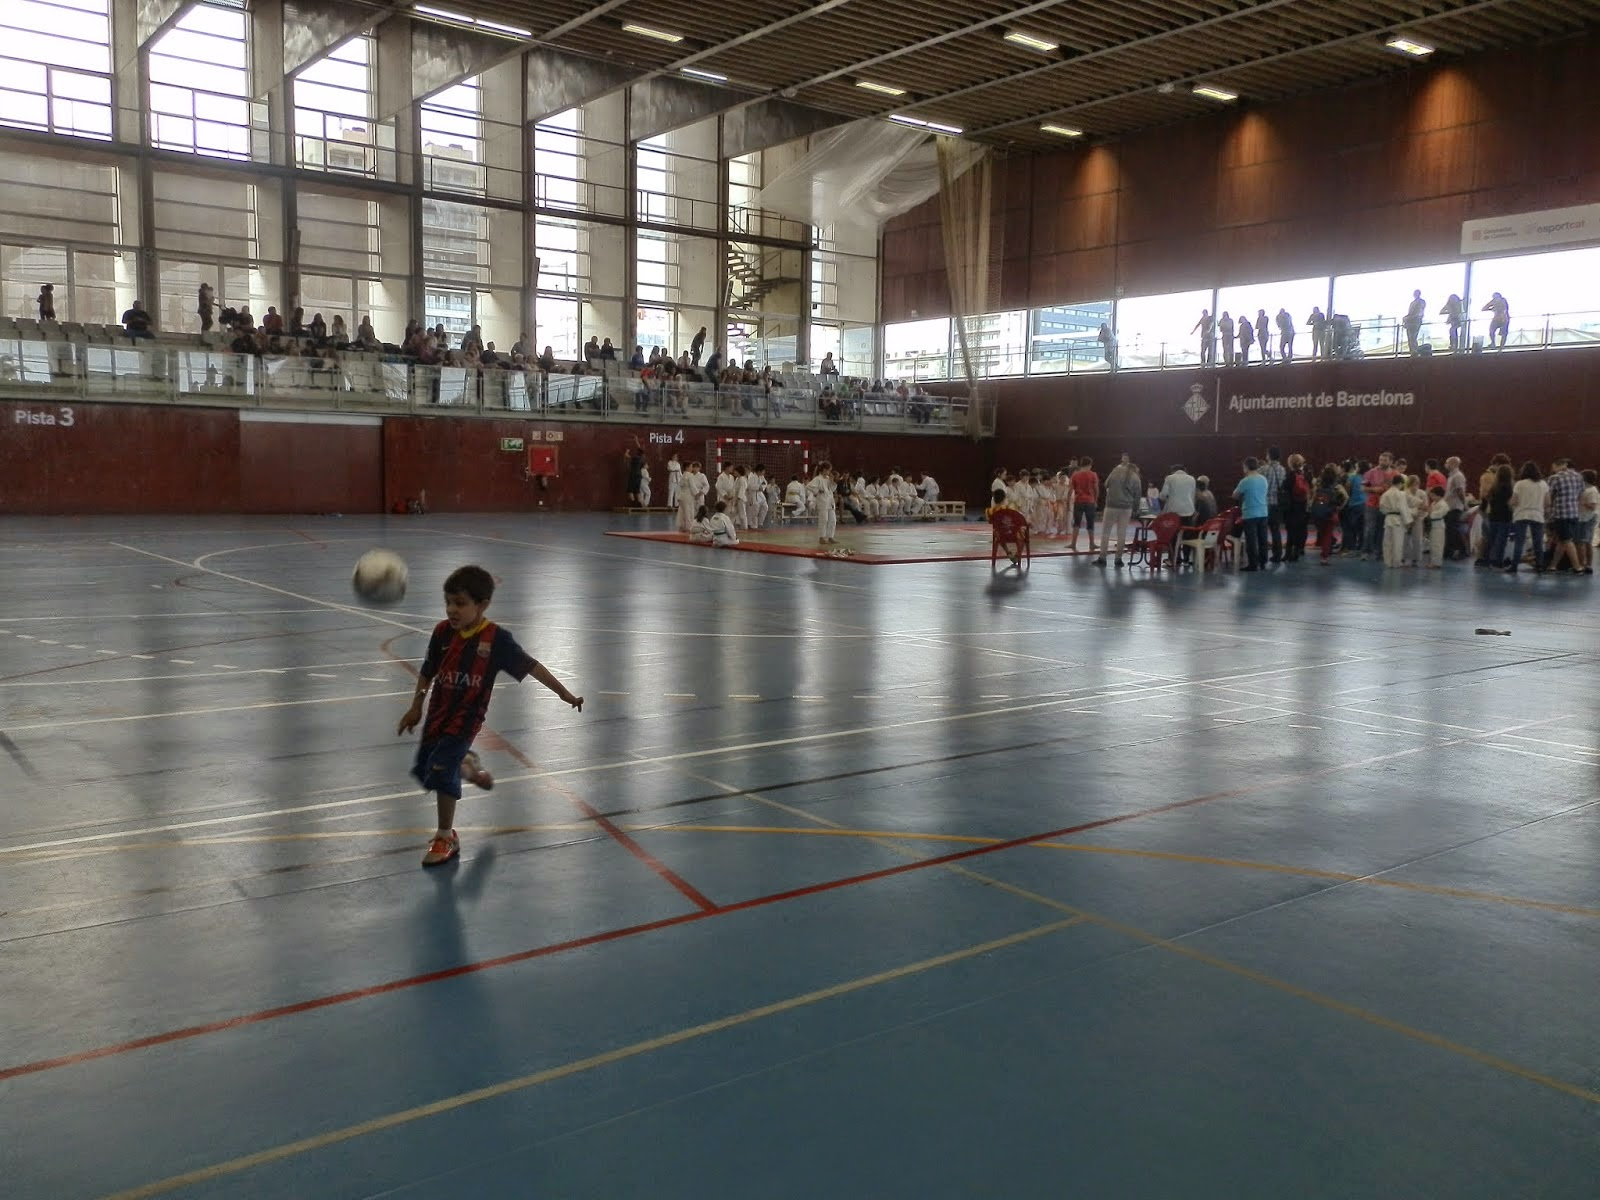 La Comunidad Islámica Al-IJLAS de Terrassa organiza una jornada deportiva